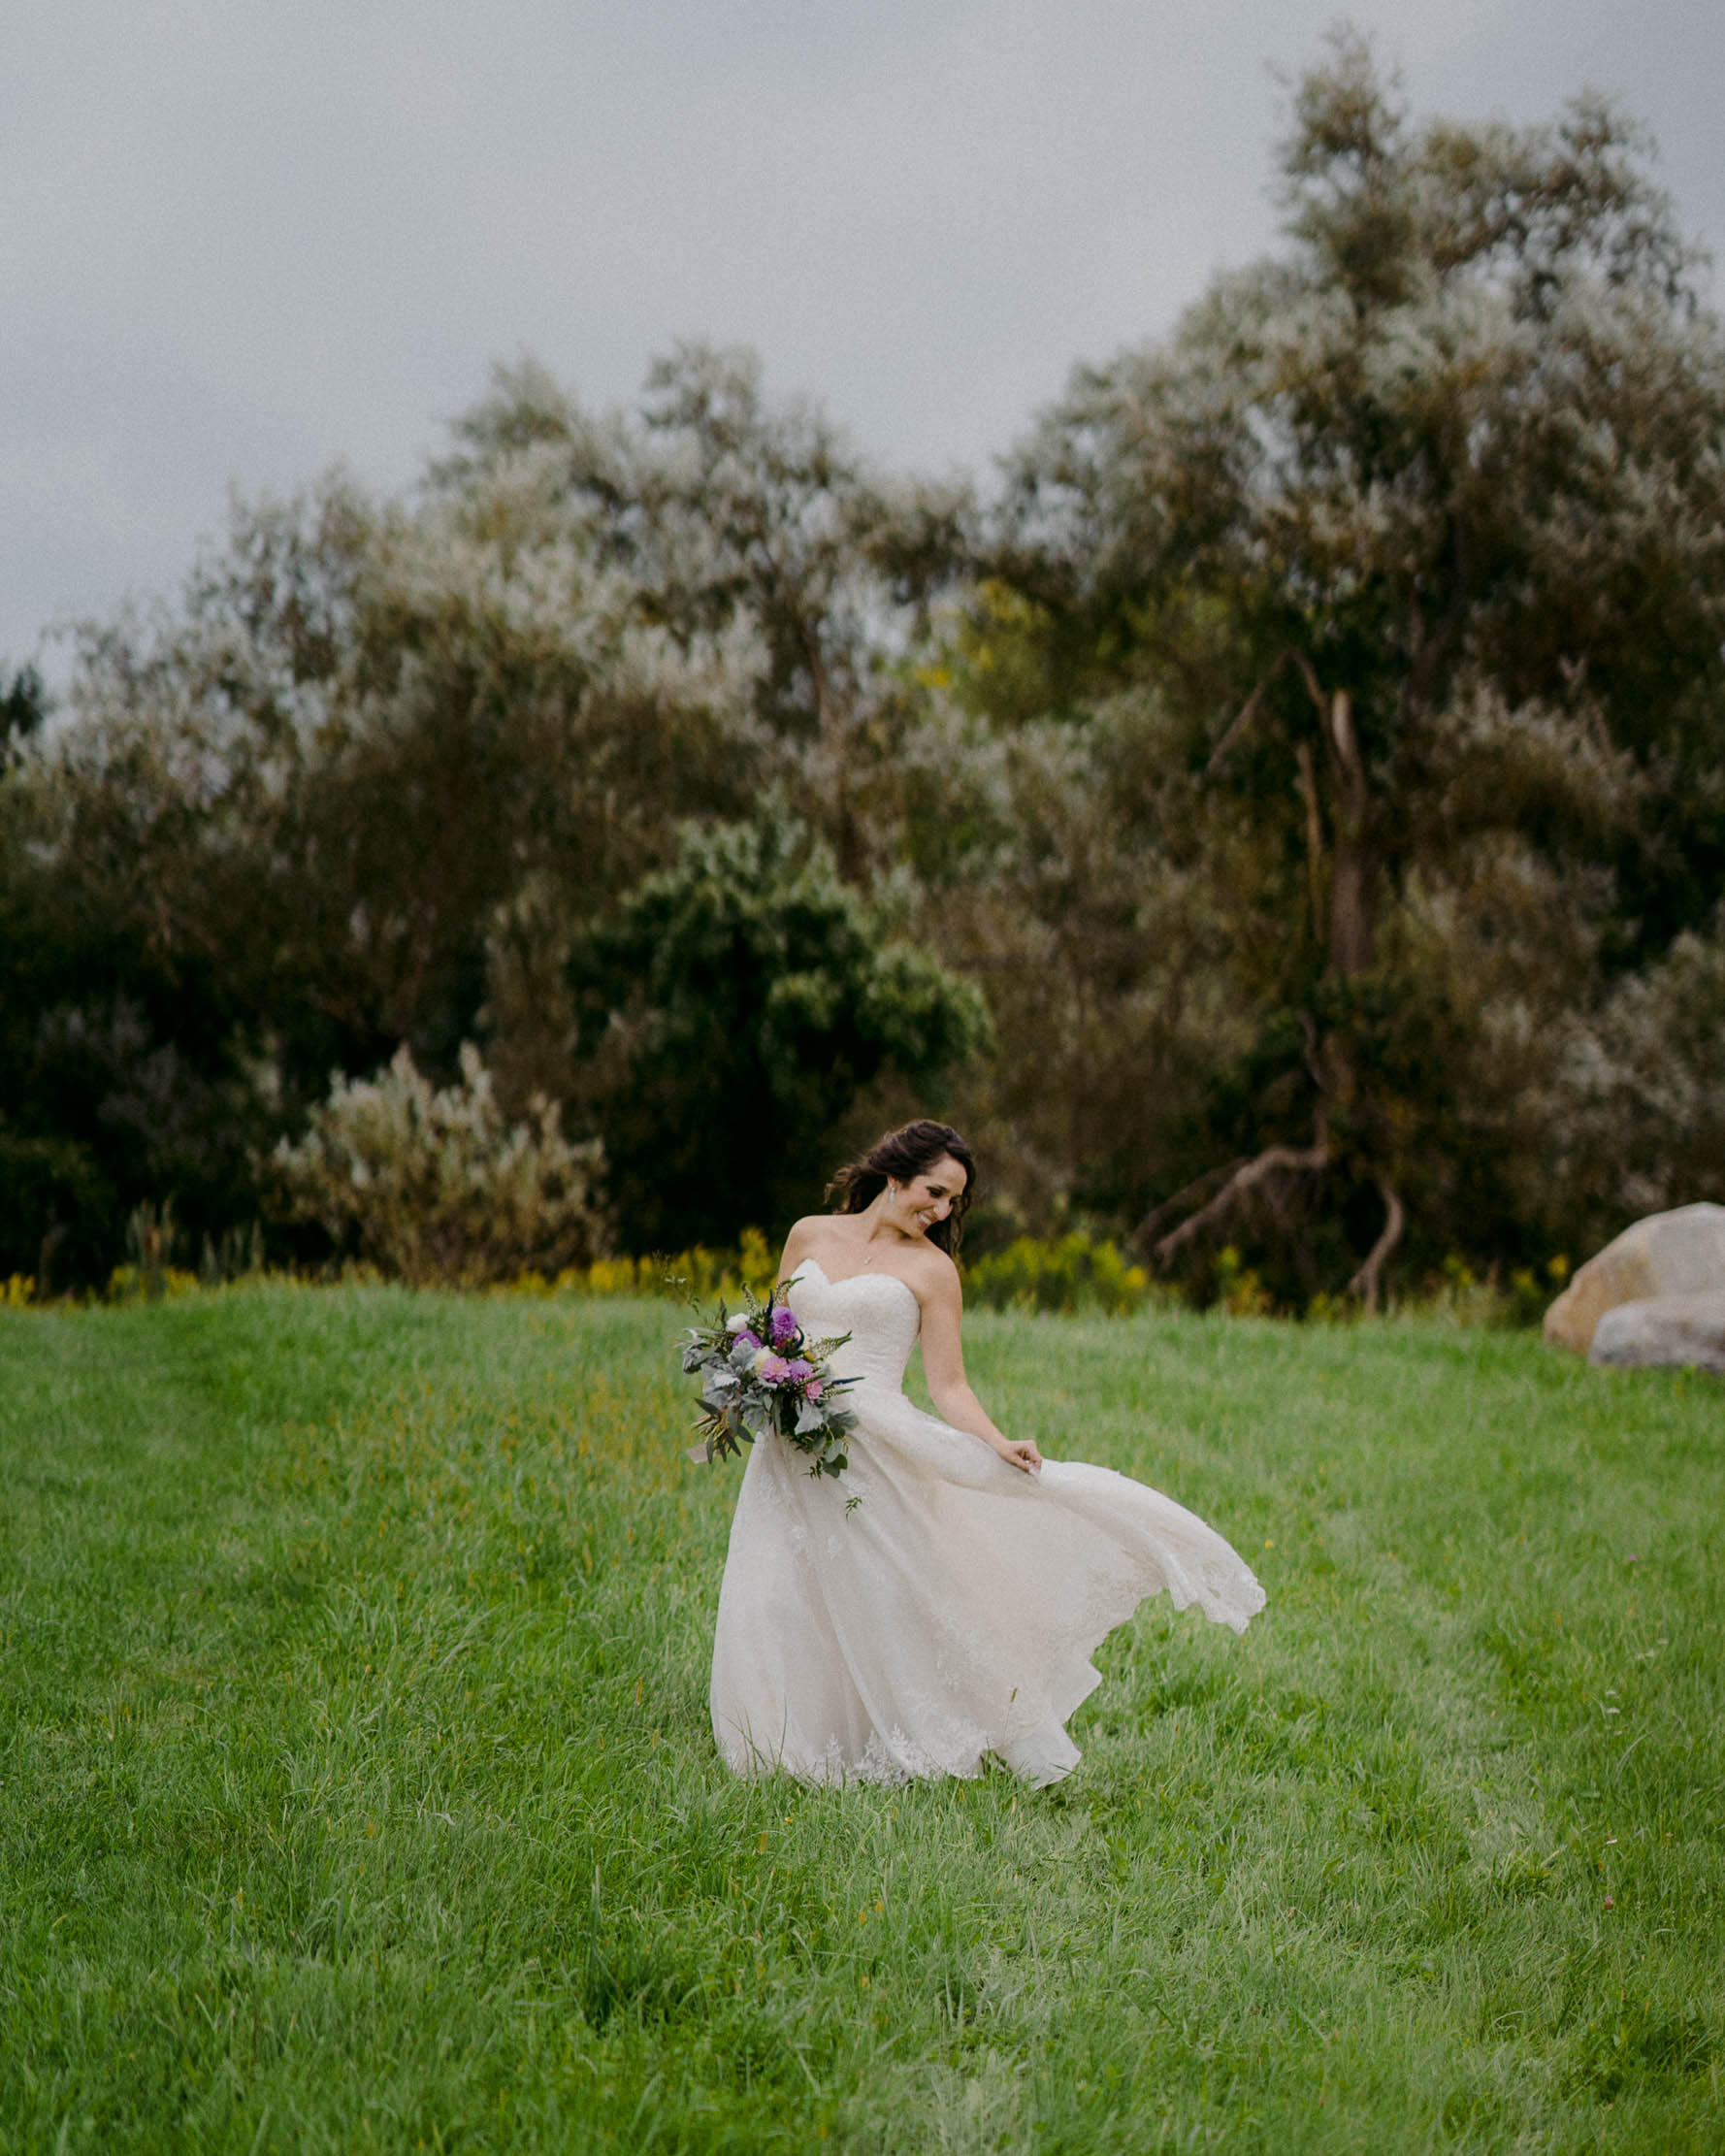 Wings-Castle-Millbrook-NY-Upstate-Wedding-Photographer-1060.jpg